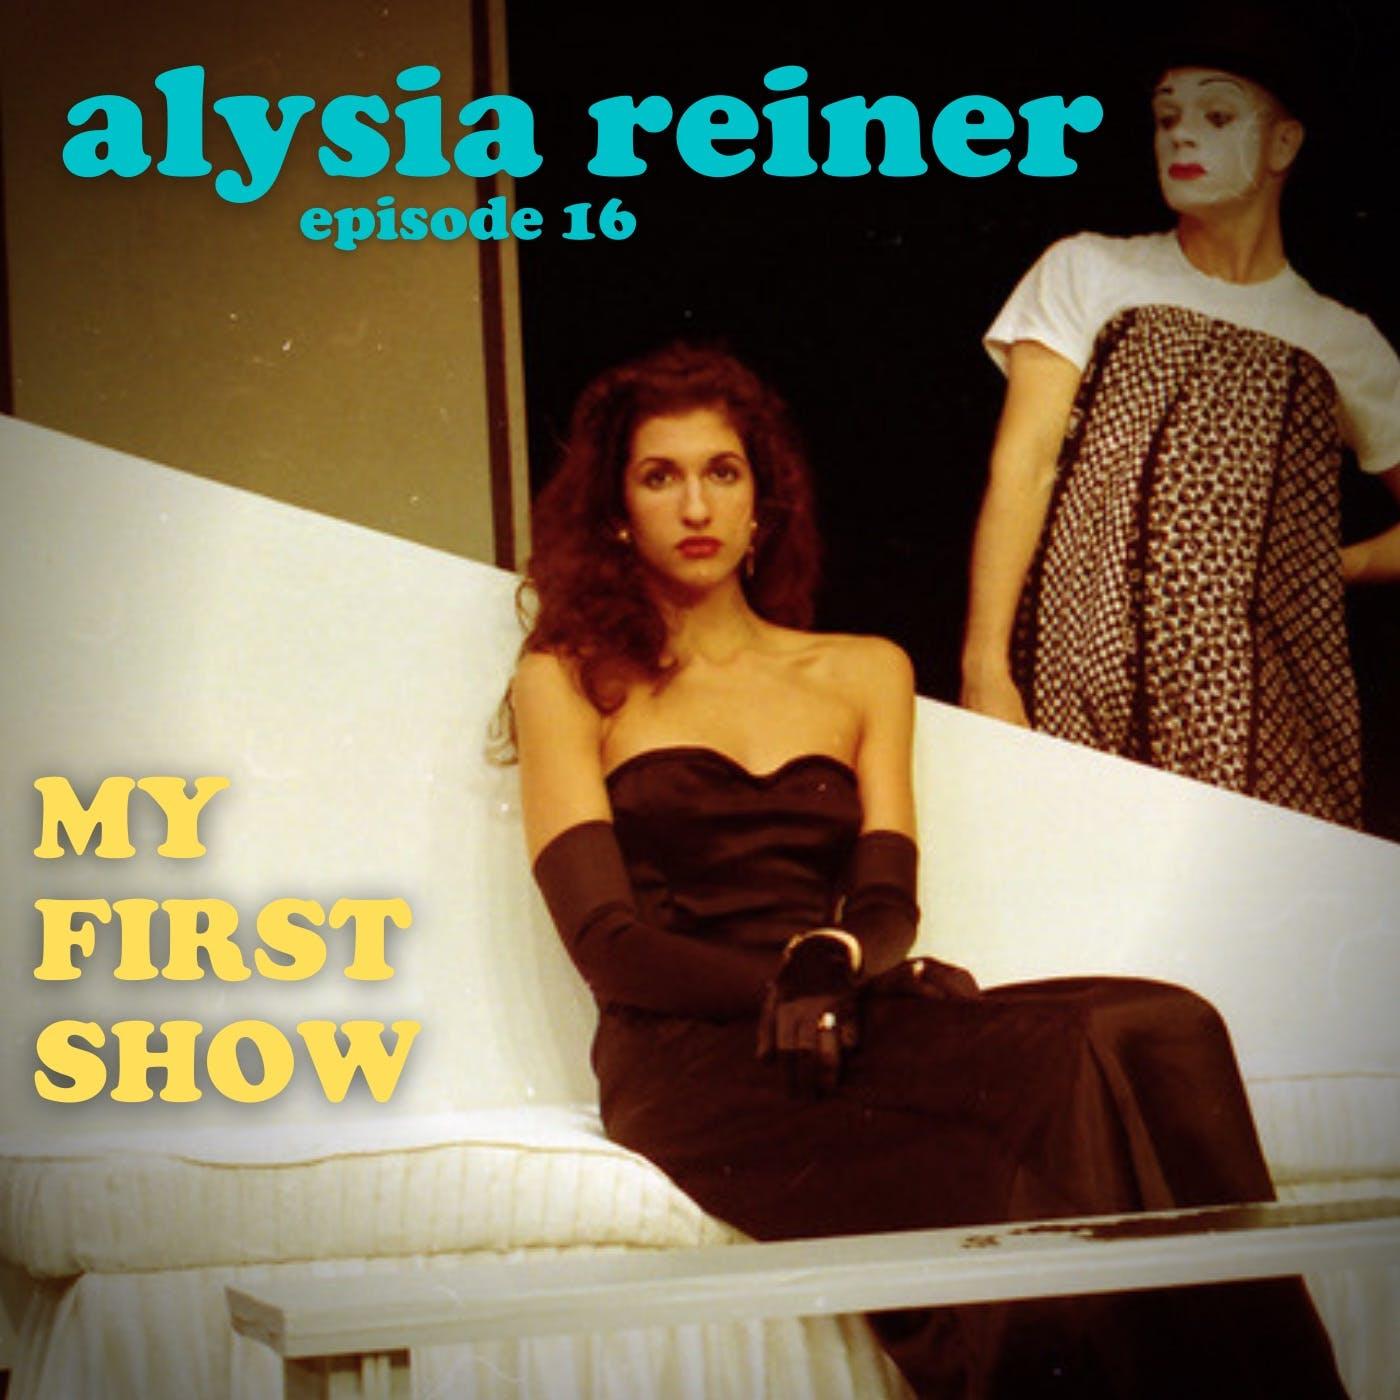 S1/Ep16: Alysia Reiner